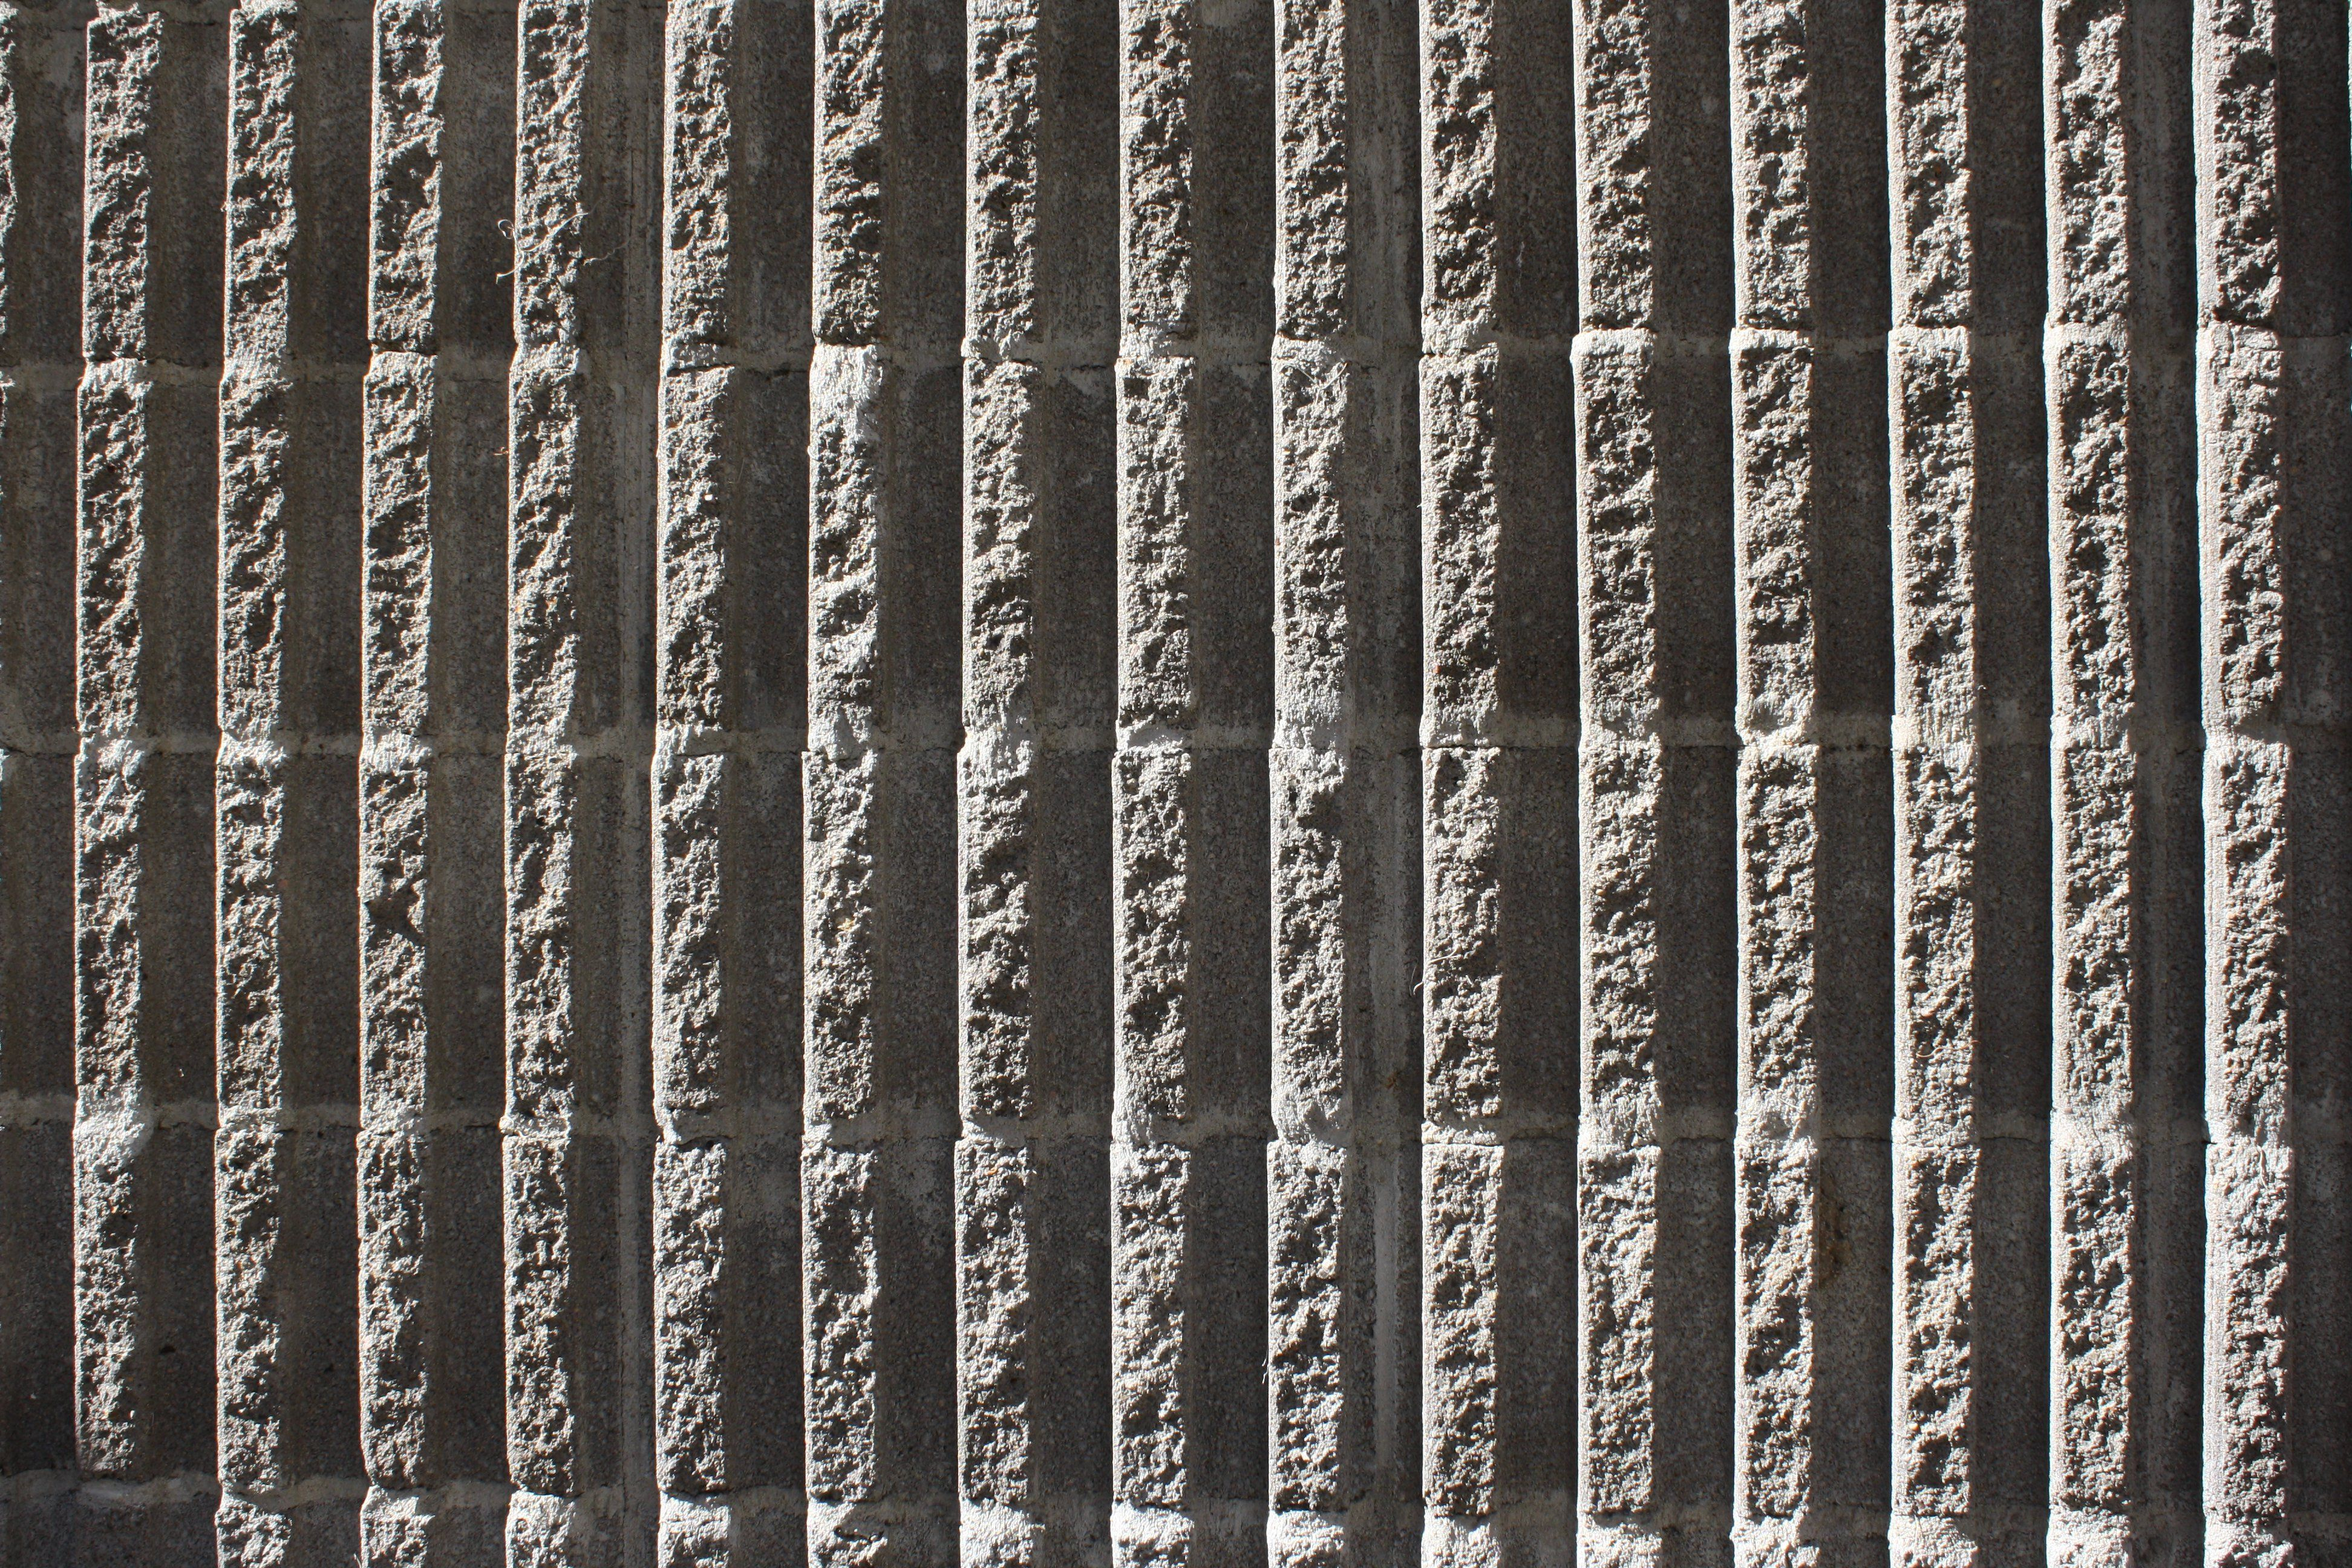 Fluted Concrete Block Wall Texture With Vertical Ridges Picture Free Photograph Concrete Block Walls Concrete Blocks Concrete Texture